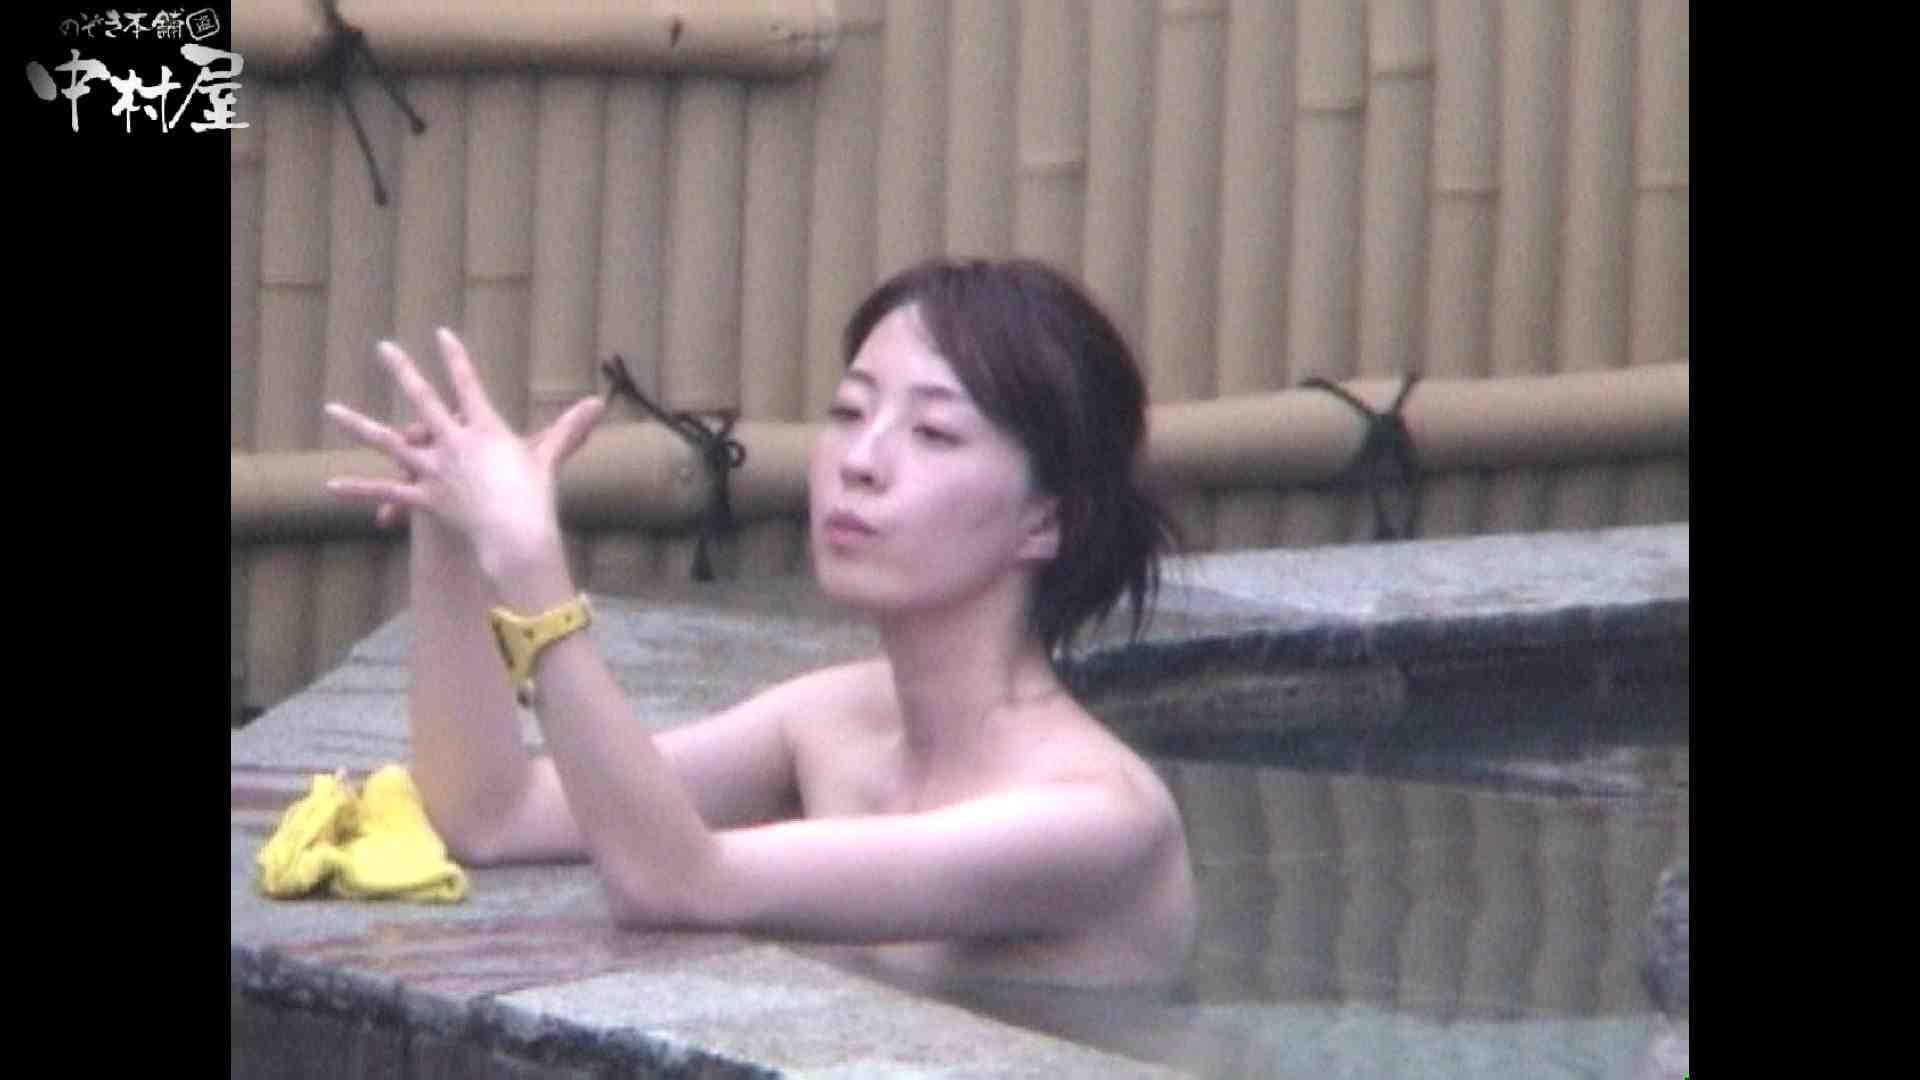 Aquaな露天風呂Vol.964 0   0  30連発 13